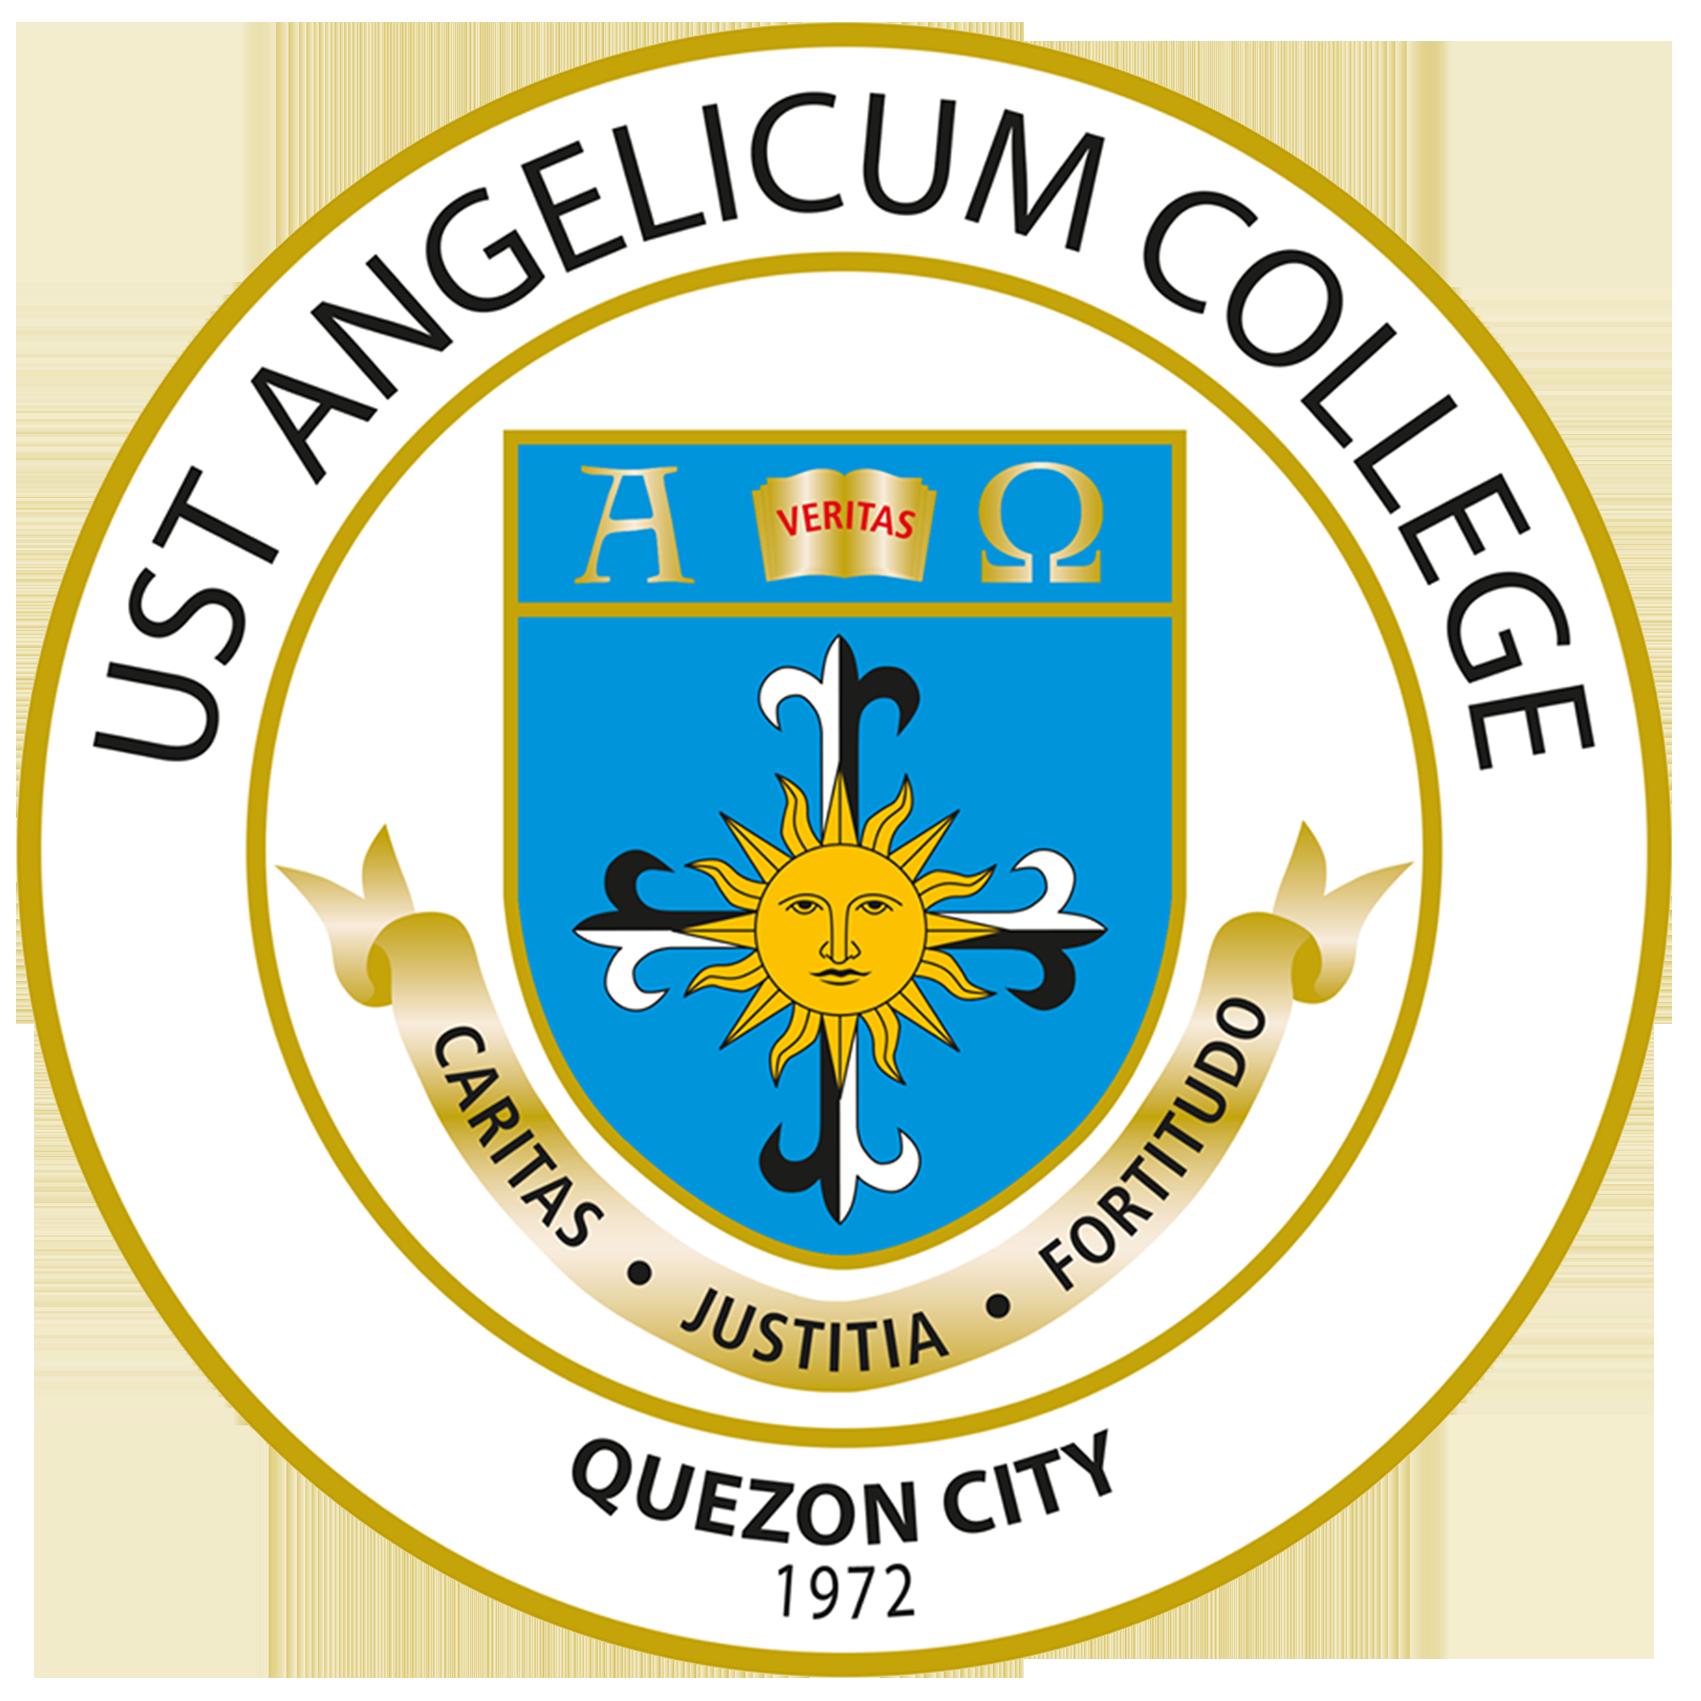 UST Angelicum College